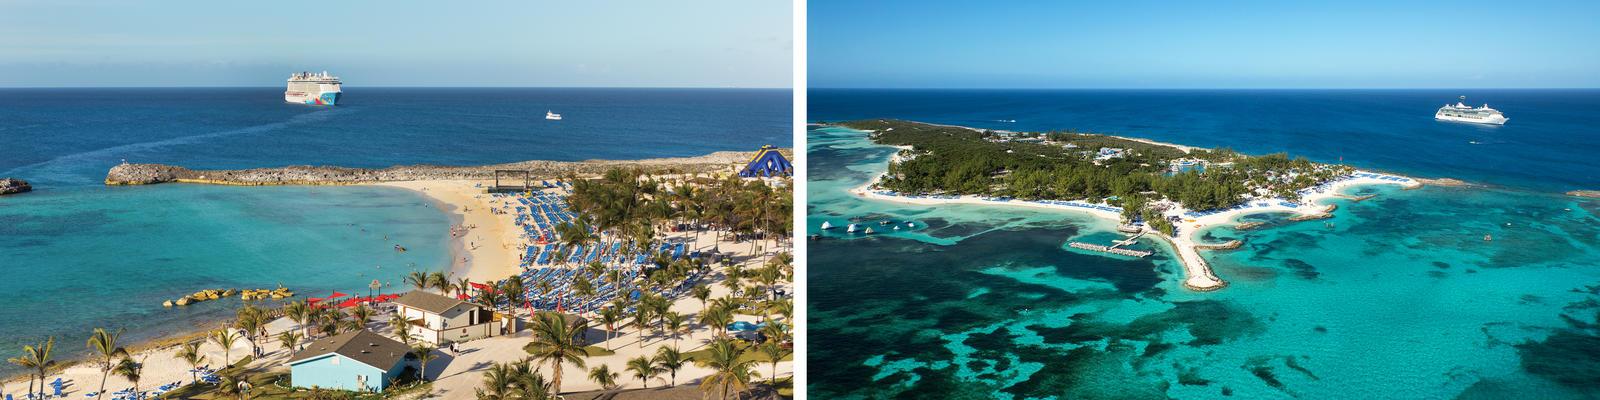 Great Stirrup Cay vs. CocoCay (Photo: Norwegian Cruise Line & Royal Caribbean International)